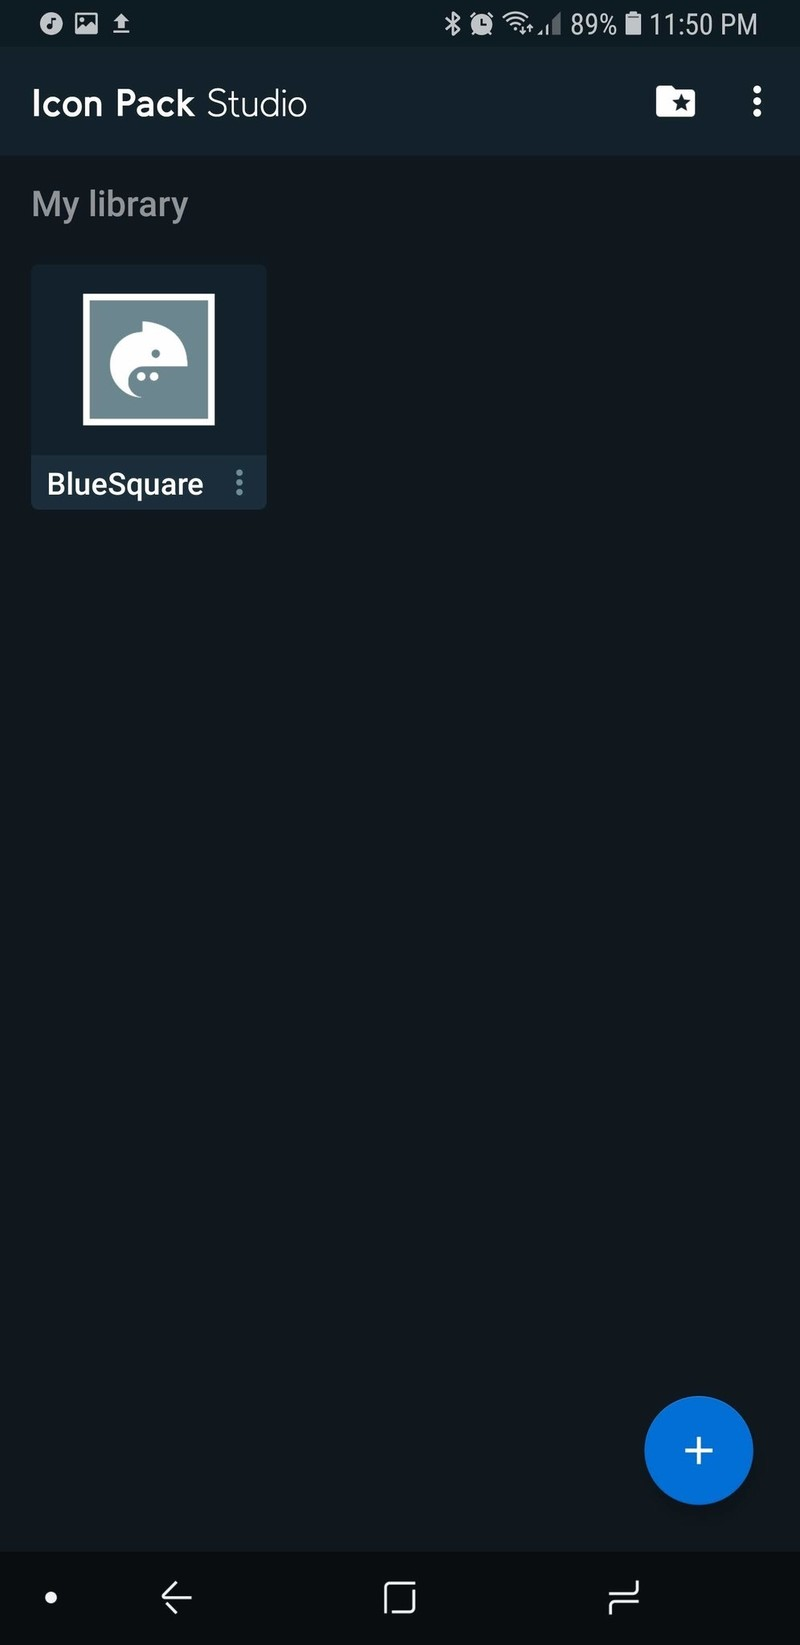 deadpool-18-icons-import-5.jpg?itok=oHMW